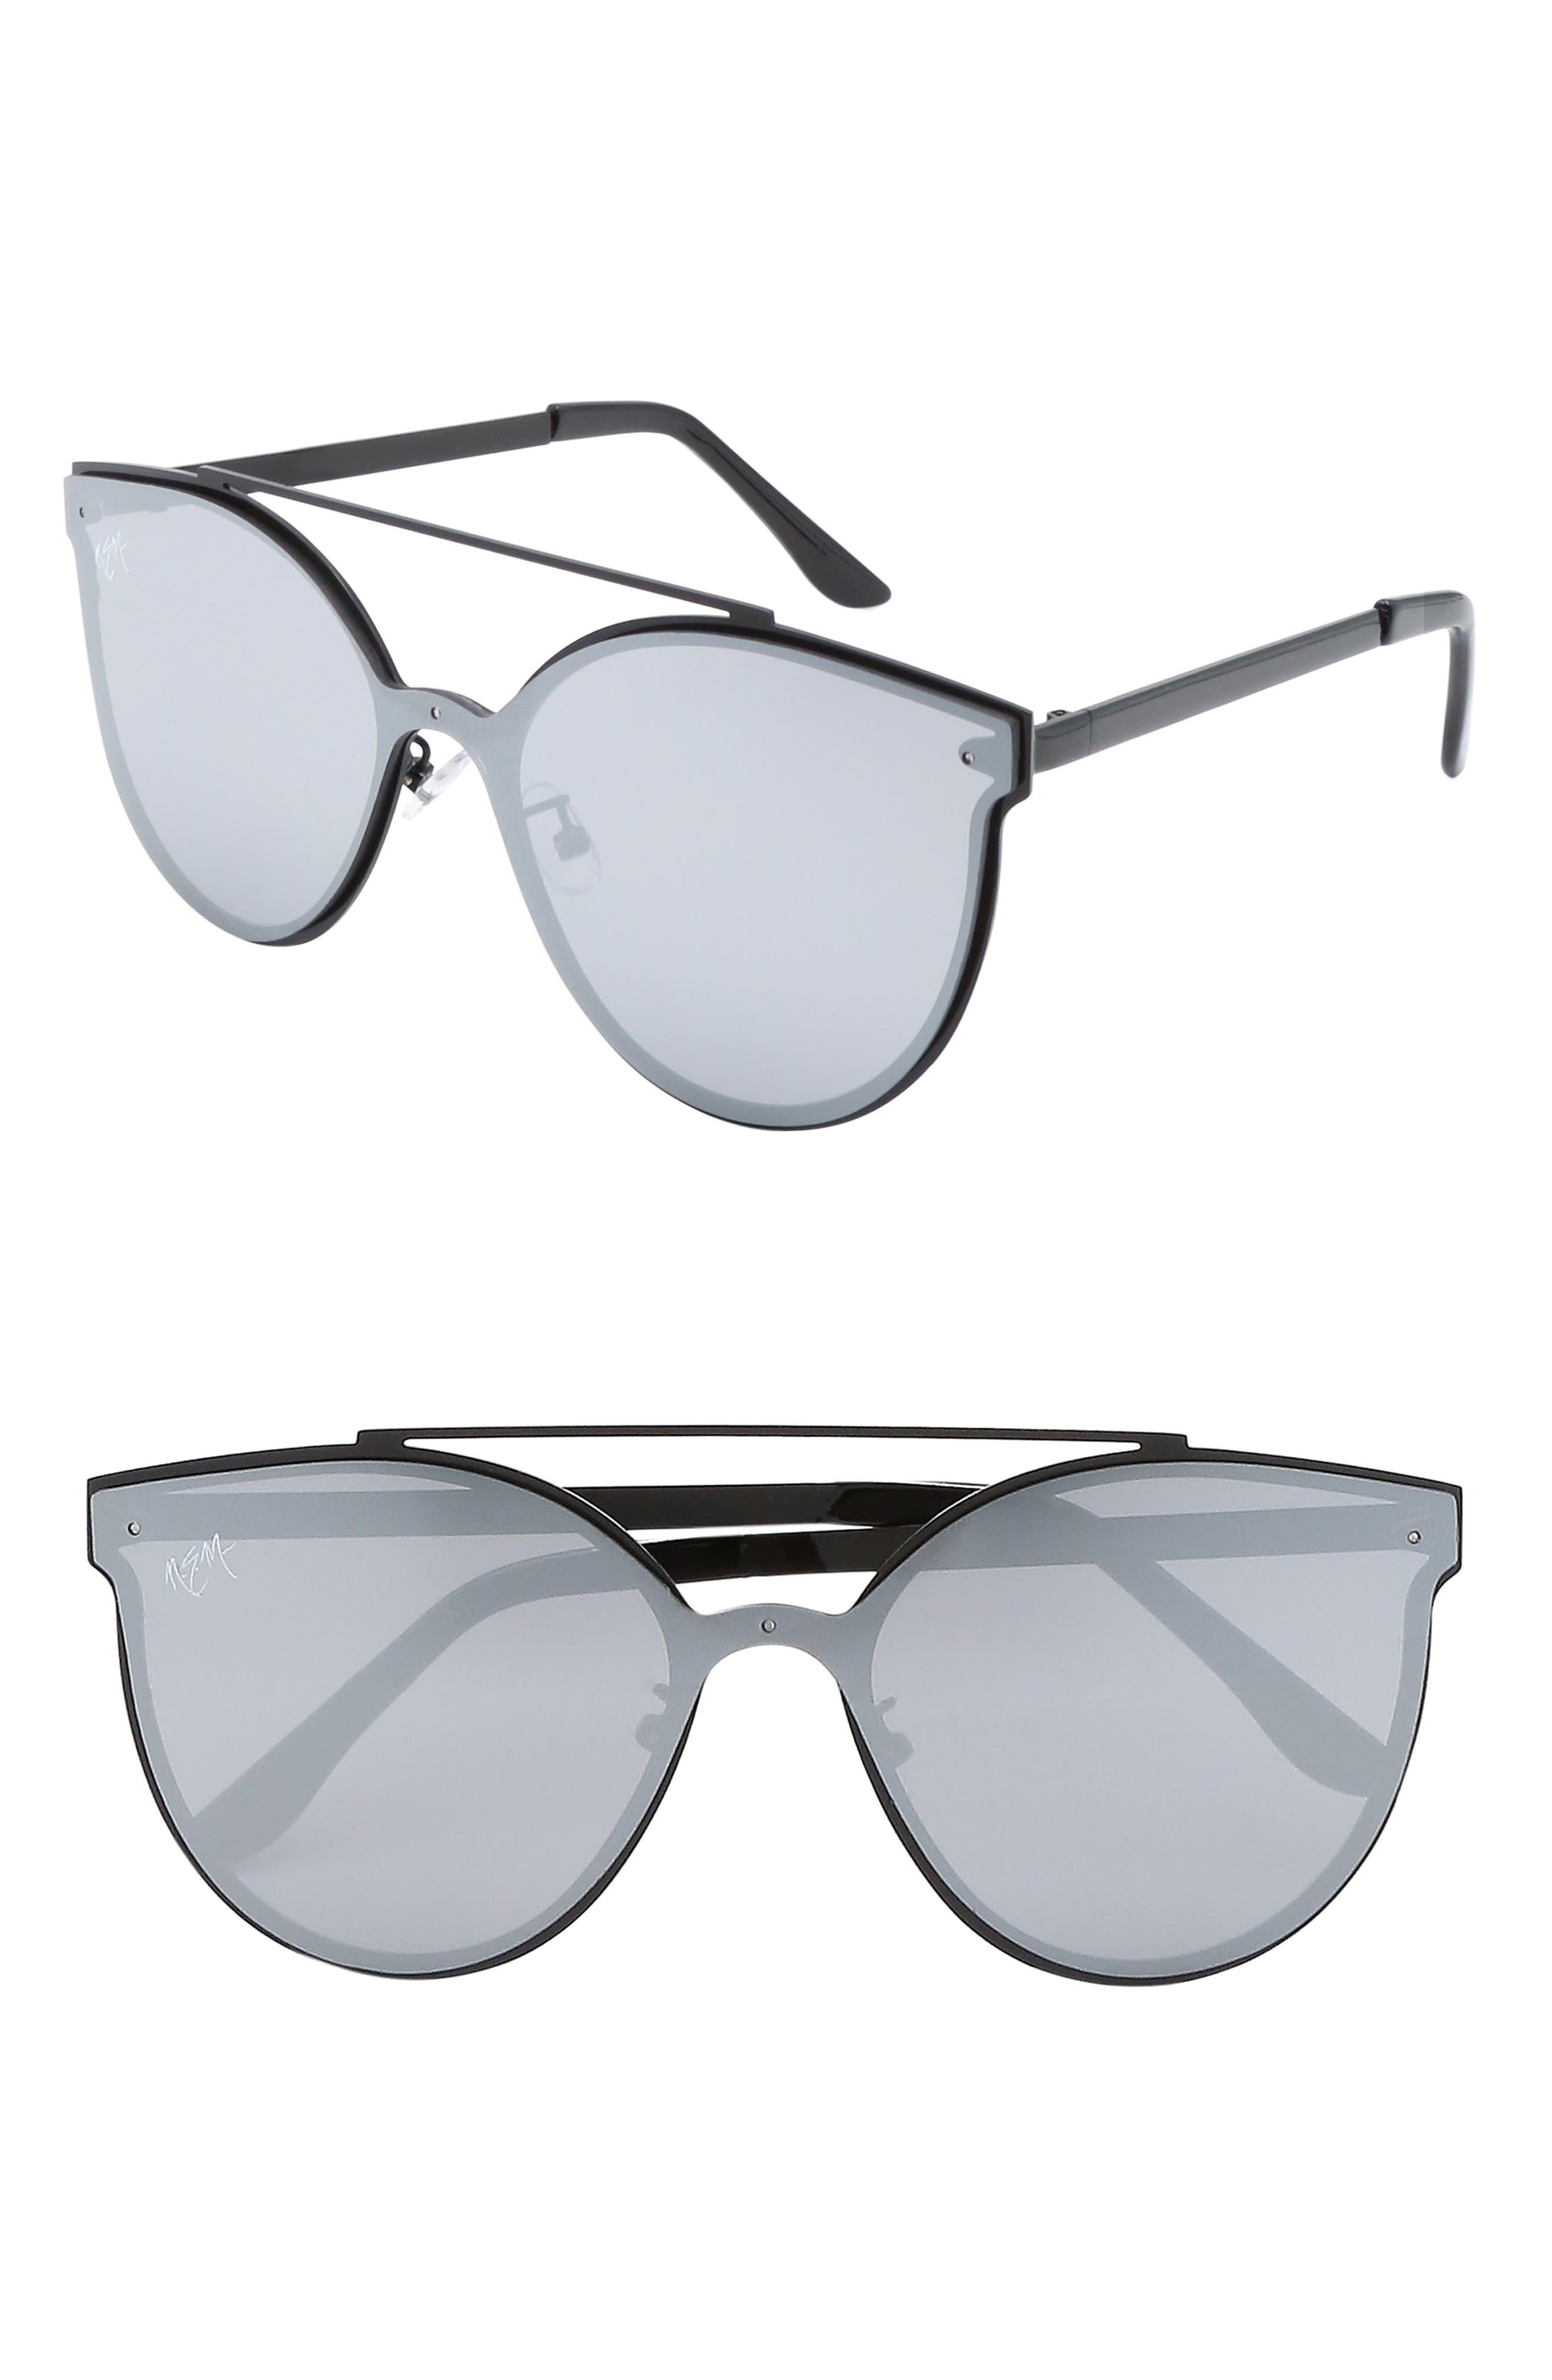 Matisse 55mm Cat Eye Sunglasses,                             Main thumbnail 1, color,                             BLACK W GREY TINTED LENS